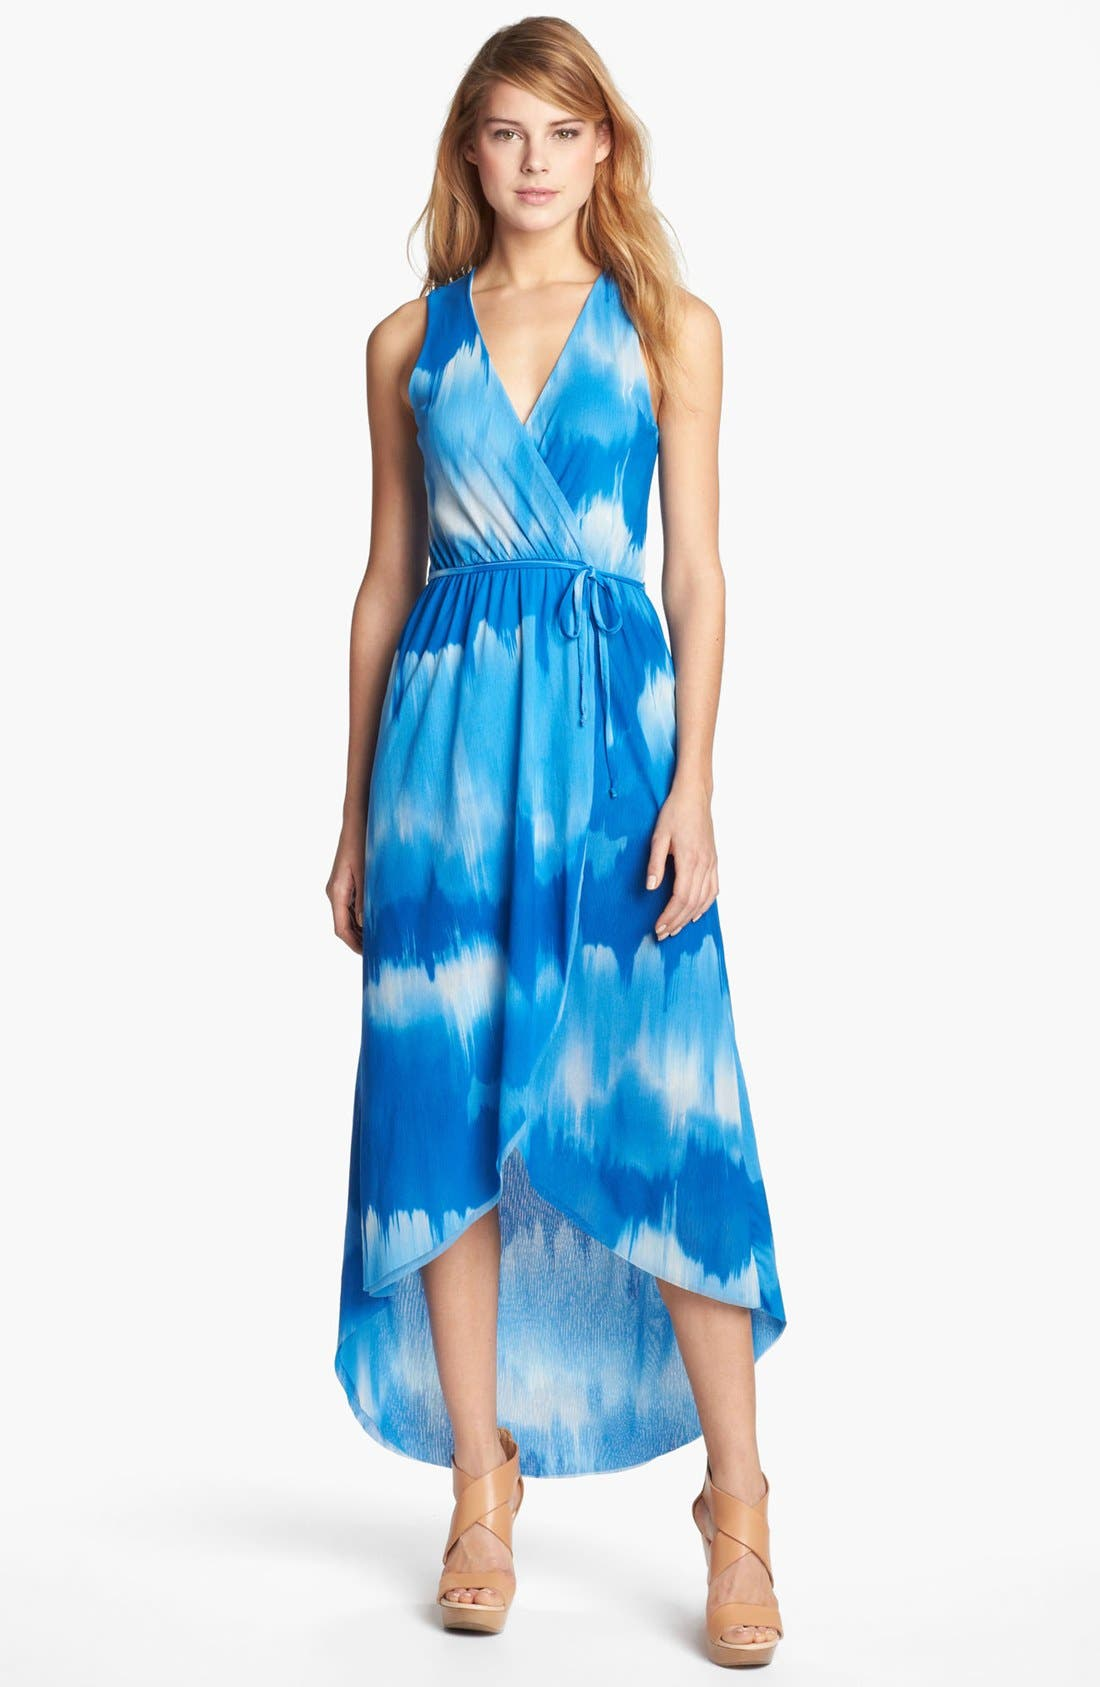 Main Image - Sweet Pea by Stacy Frati Print Surplice Dress